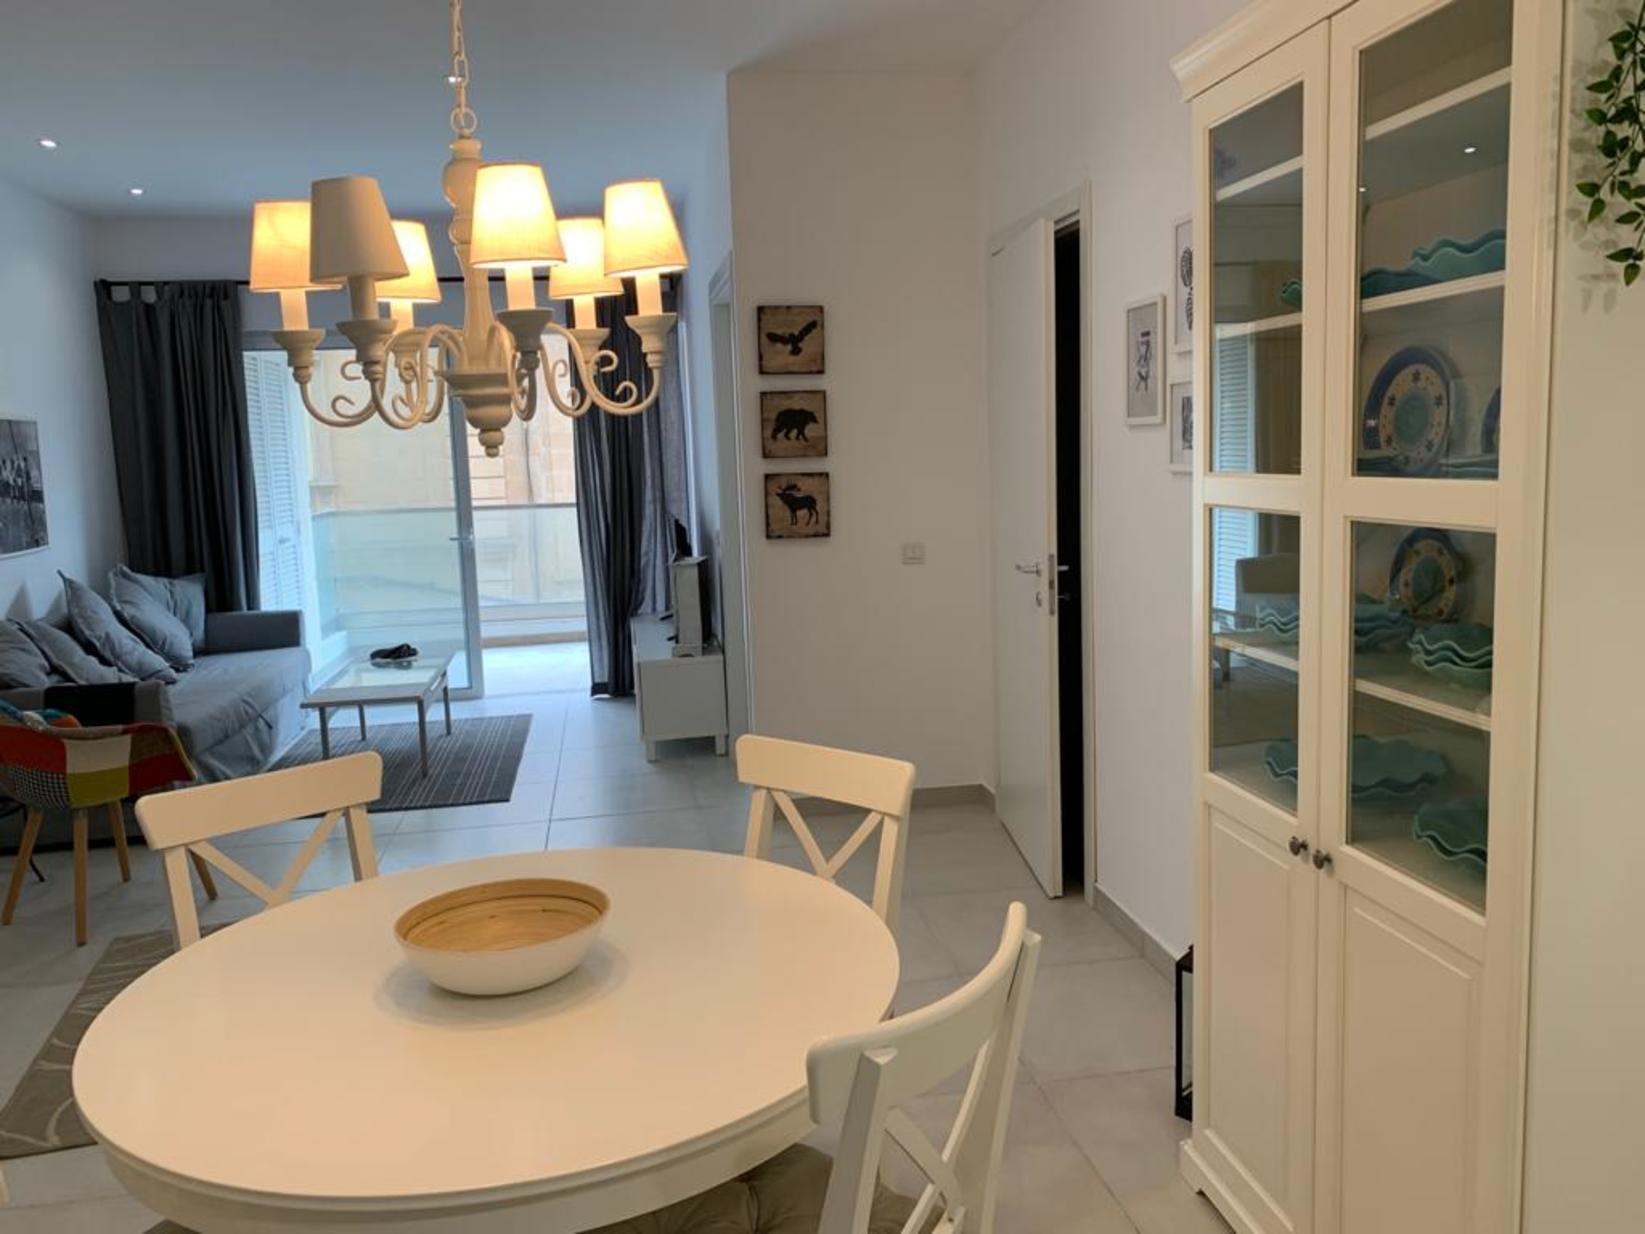 1 bed Apartment For Rent in Sliema, Sliema - thumb 14